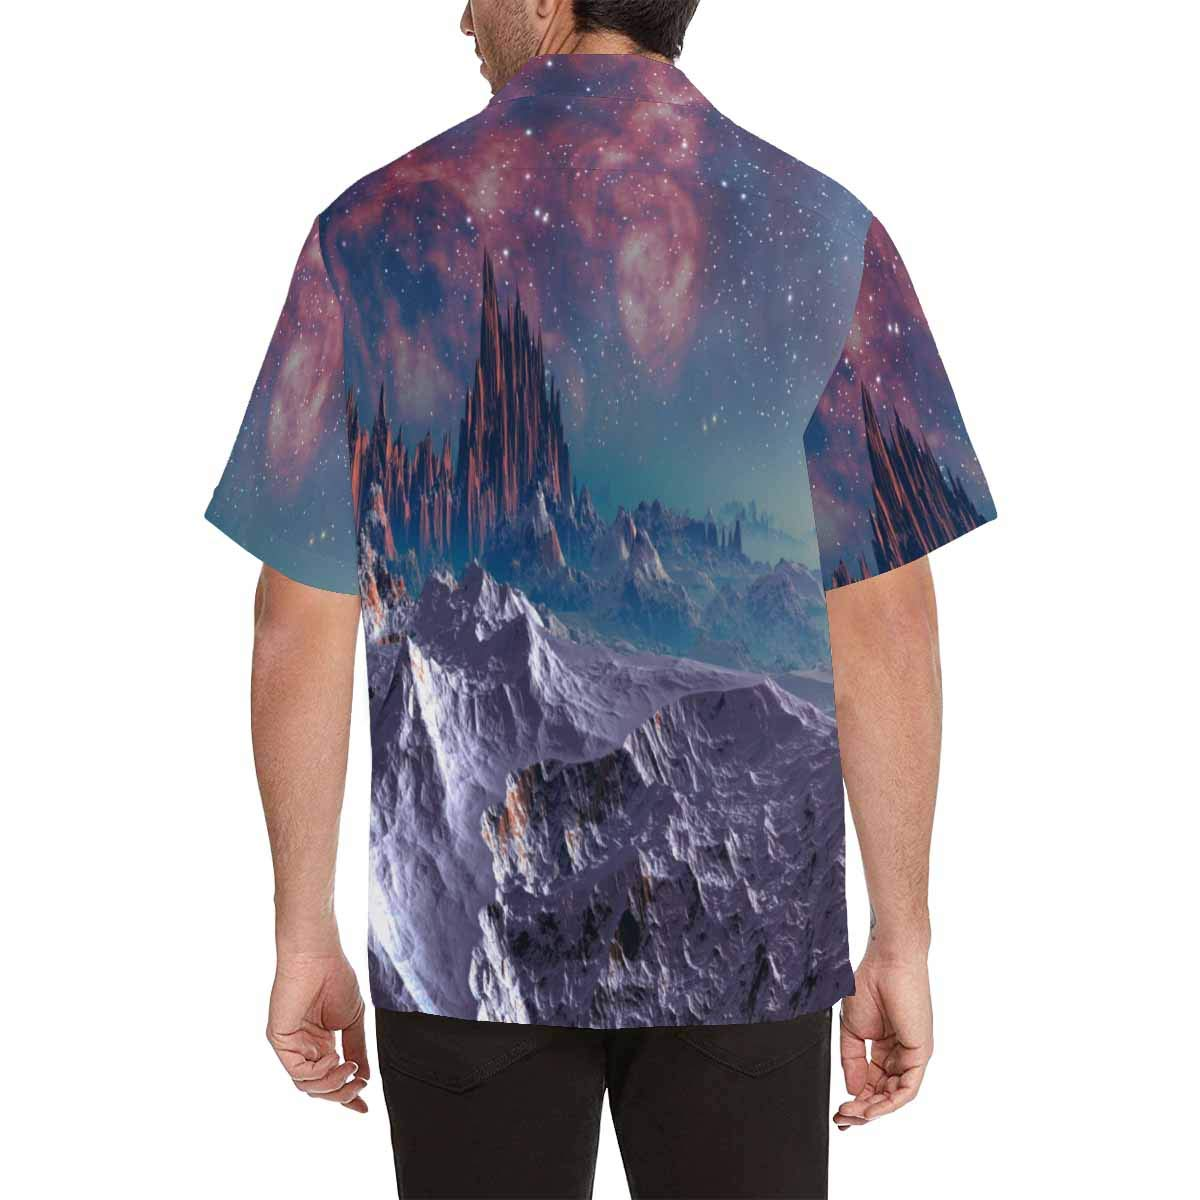 InterestPrint Mens Alien Planet Tees Tops T-Shirts